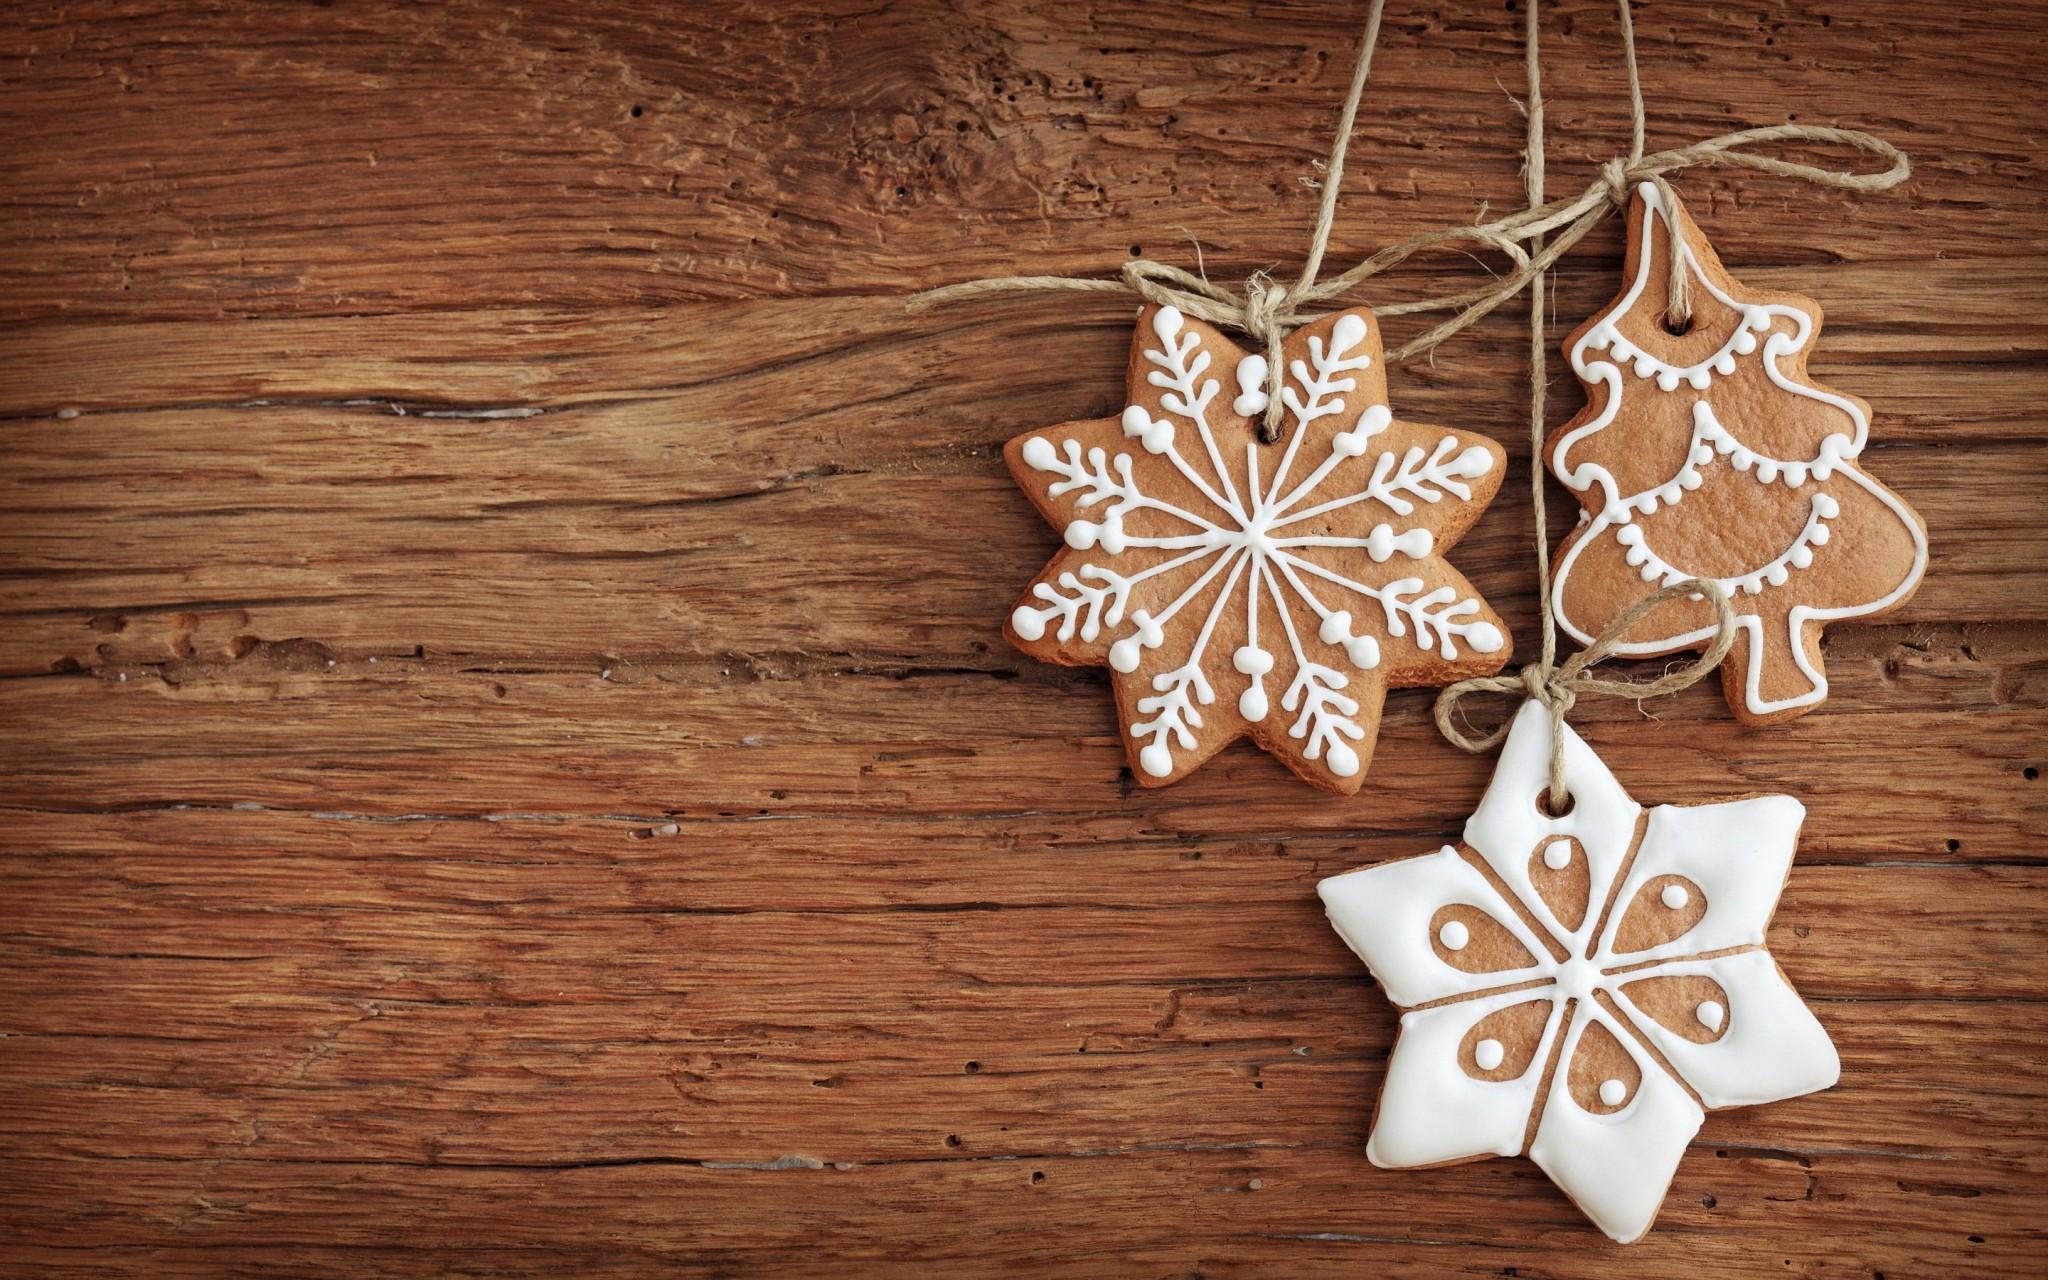 Christmas Cookies British School Of Coaching